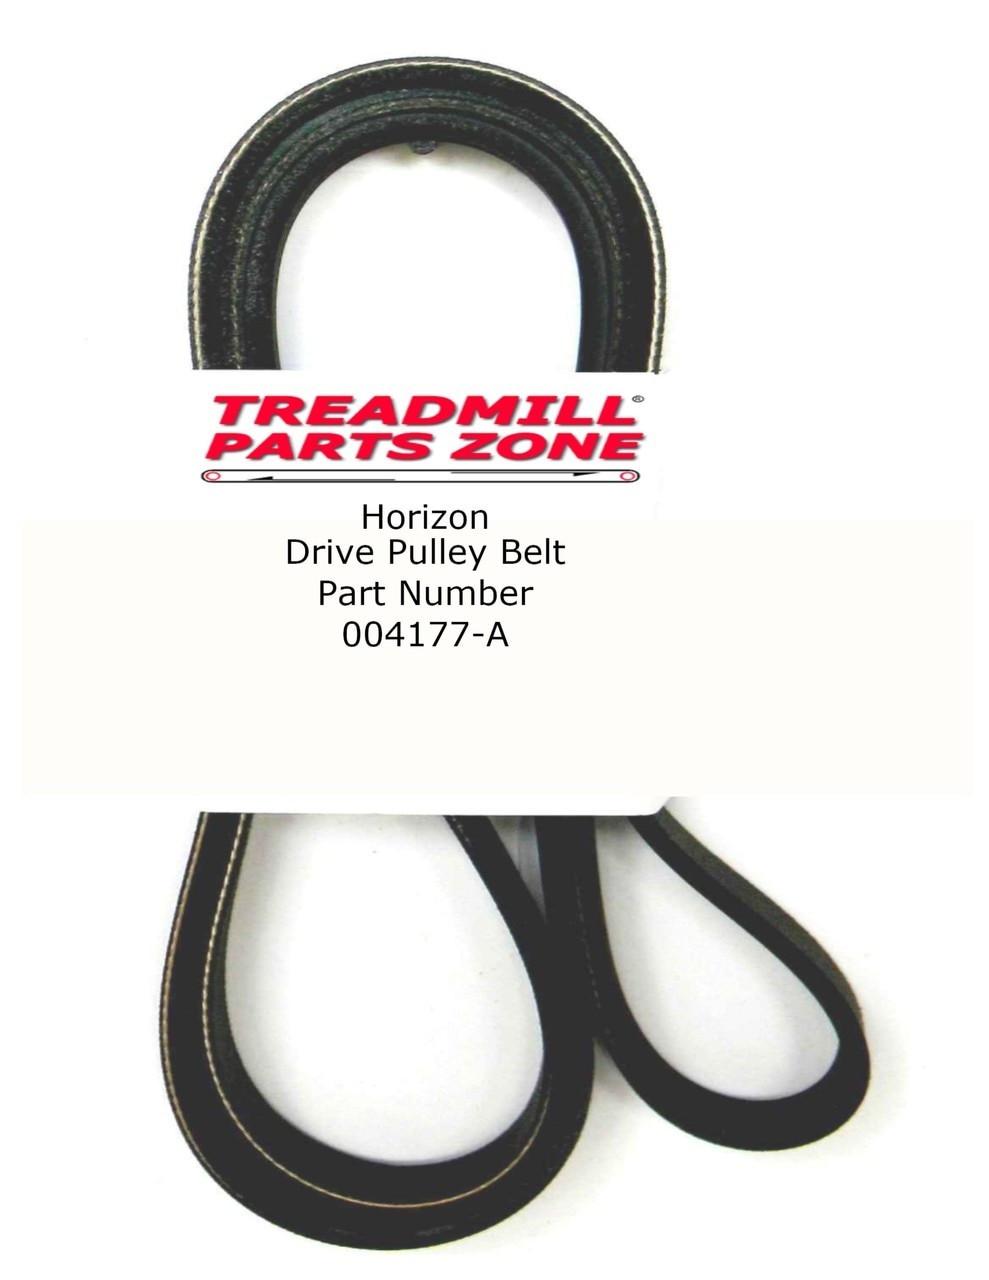 Horizon Elliptical Model 30701 Sears Free Spirit Drive Pulley Belt Part Number 004177-A